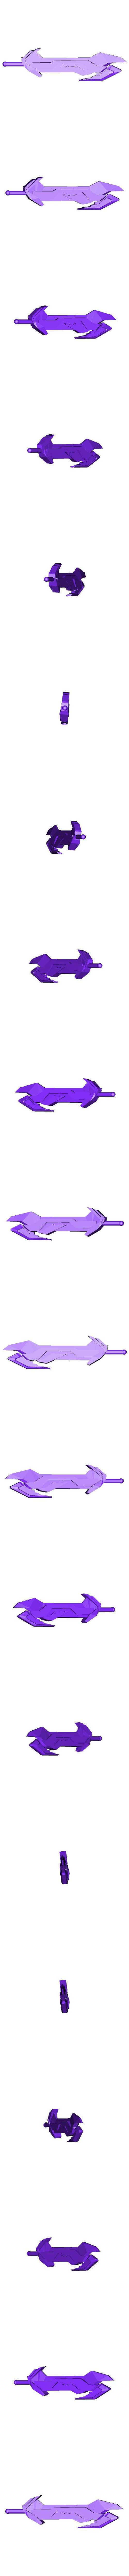 blade.stl Download free STL file Energon Blades for Hatsune Miku • Template to 3D print, Megawillbot